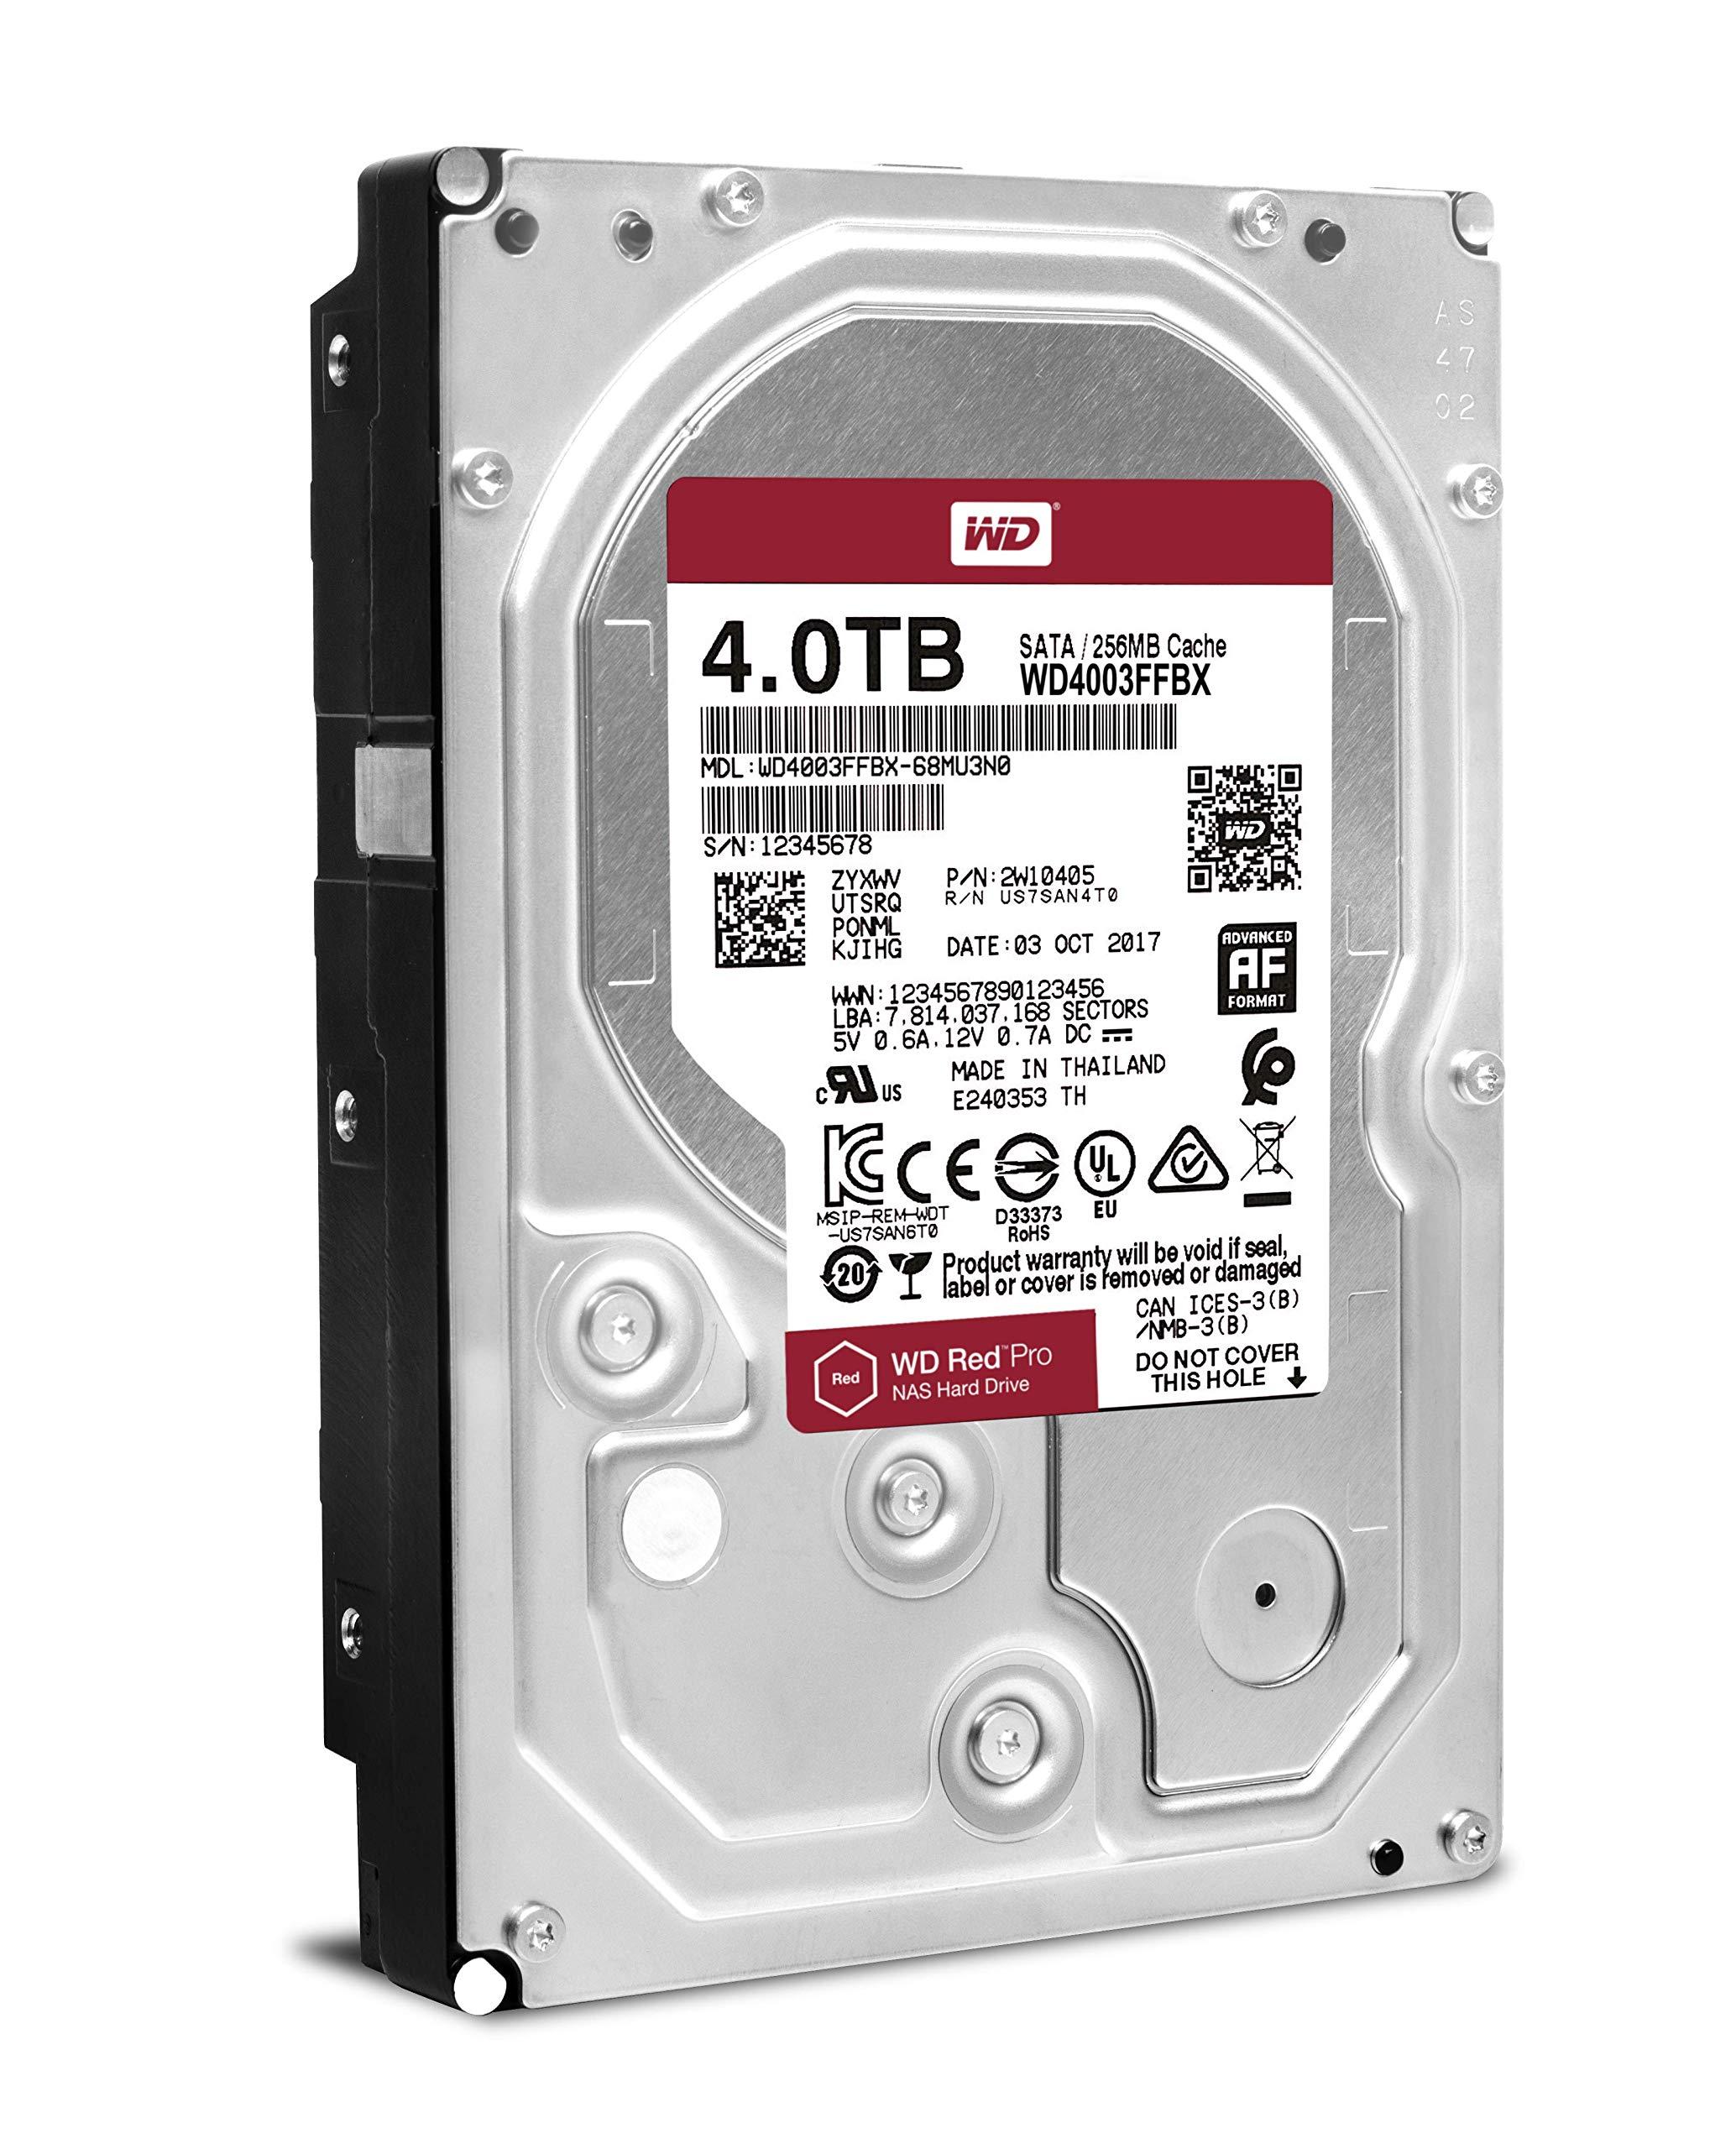 WD Red Pro 4TB NAS Internal Hard Drive - 7200 RPM Class, SATA 6 Gb/s, 256 MB Cache, 3.5'' - WD4003FFBX by Western Digital (Image #4)